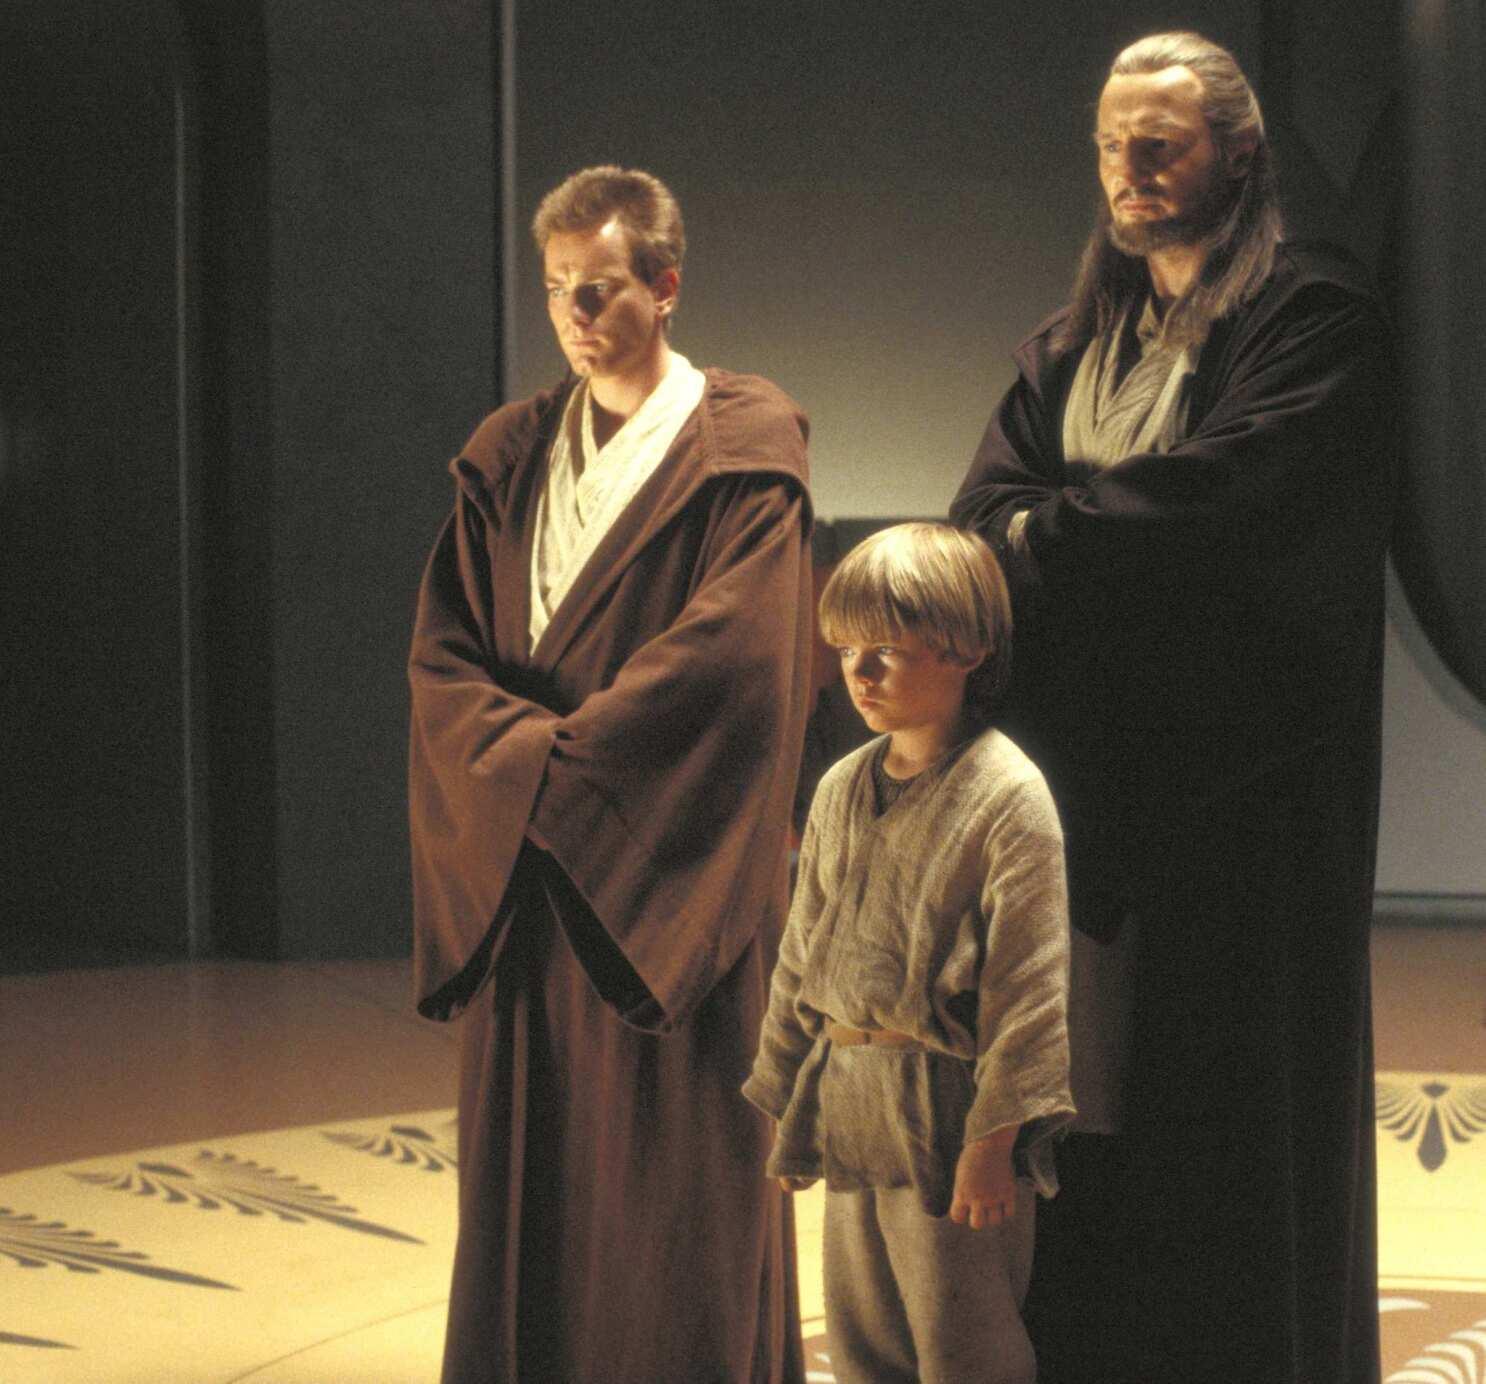 Ewan Mcgregor S Obi Wan Is Back What S Next After Disney Announcement Los Angeles Times